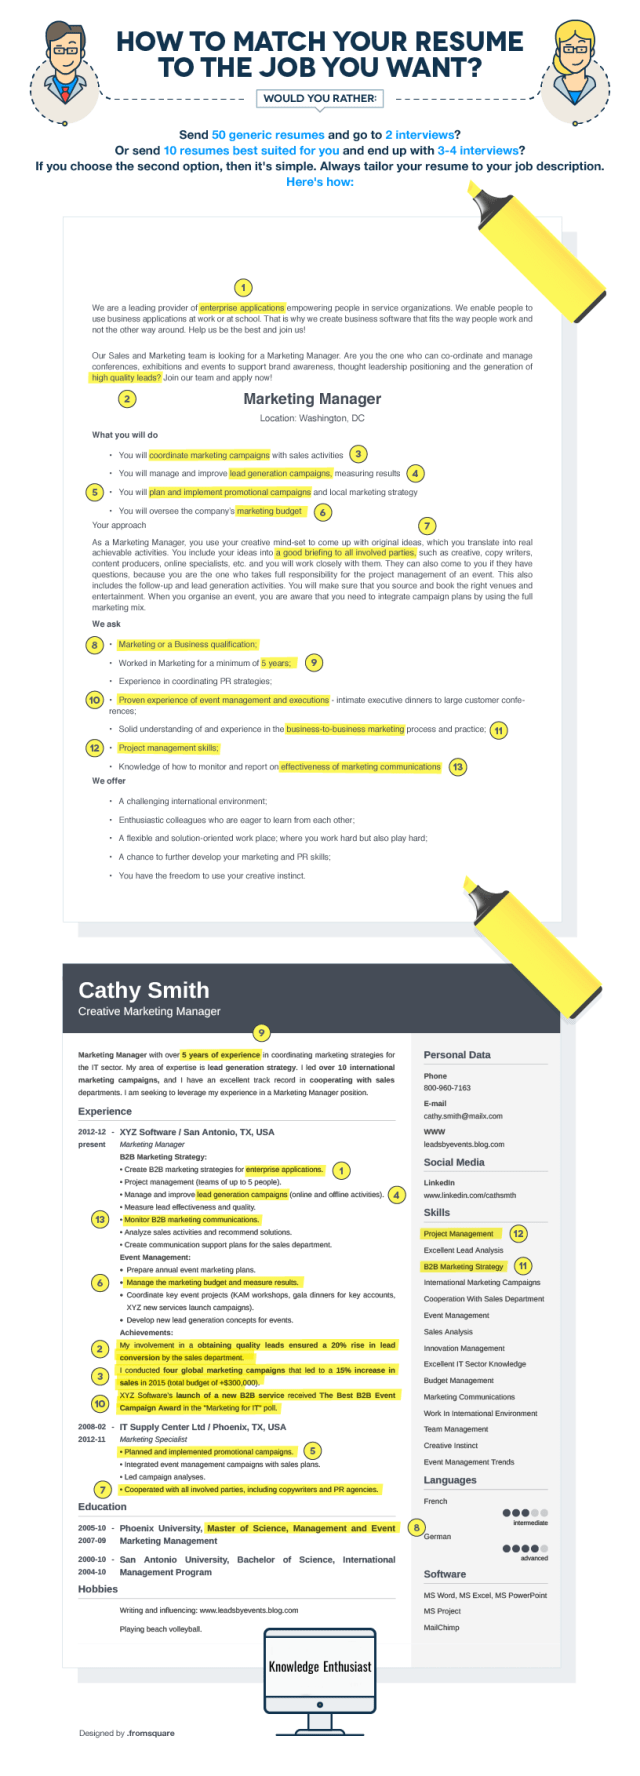 Match Resume to Job Infographic KE compressed